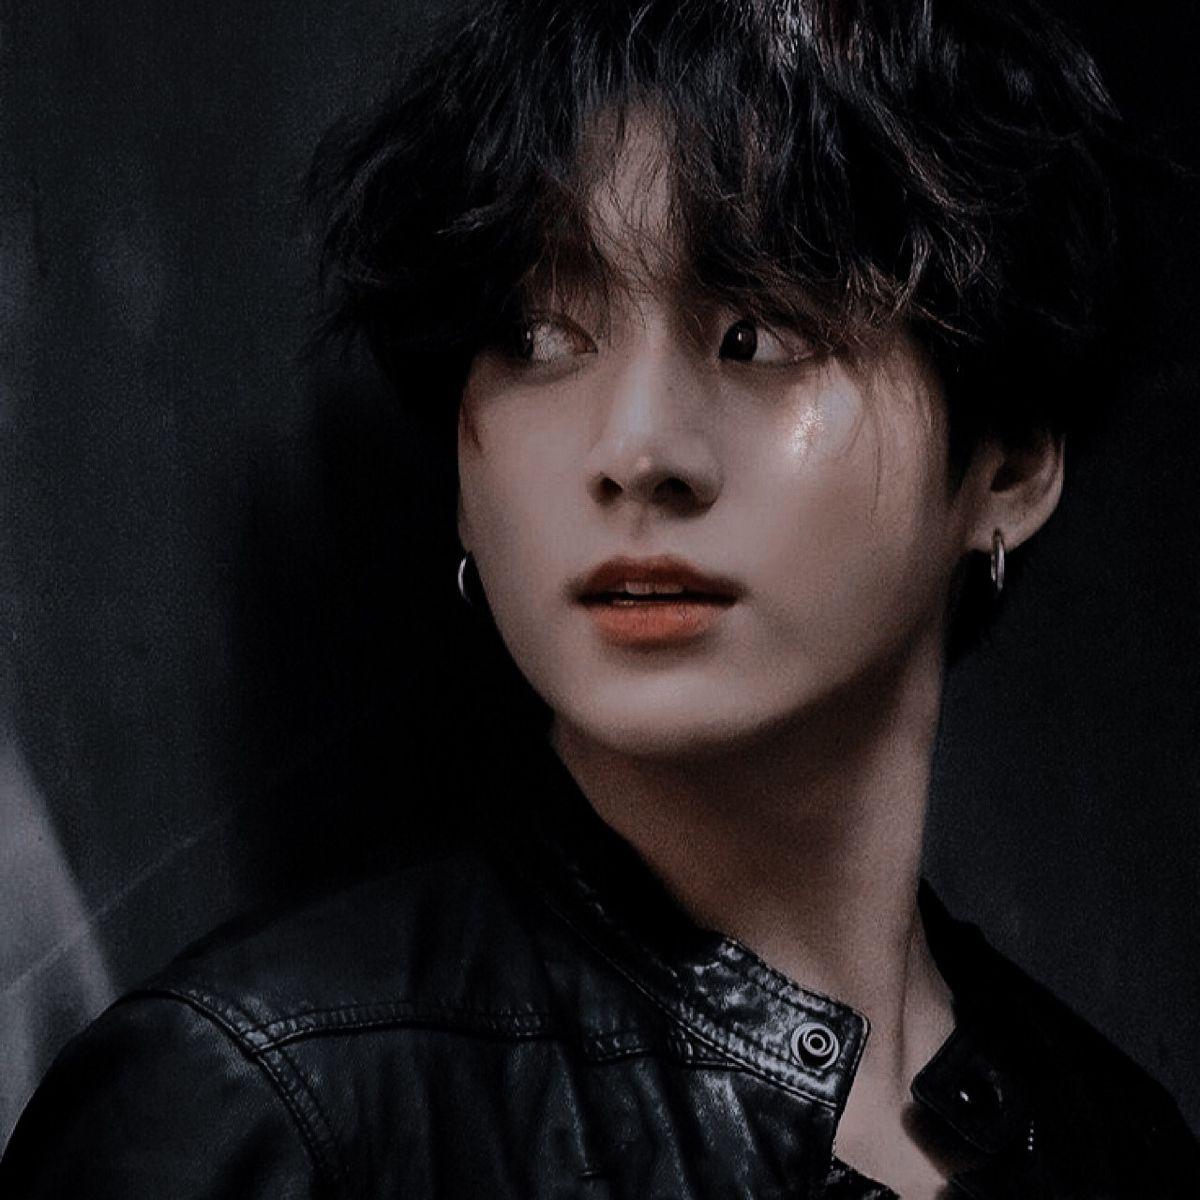 𝐉𝐔𝐍𝐆𝐊𝐎𝐎𝐊. ©𝘴𝘦𝘺𝘵𝘢𝘦𝘯 இ 𖥸 ♡ ྀ in 2020 Jungkook aesthetic